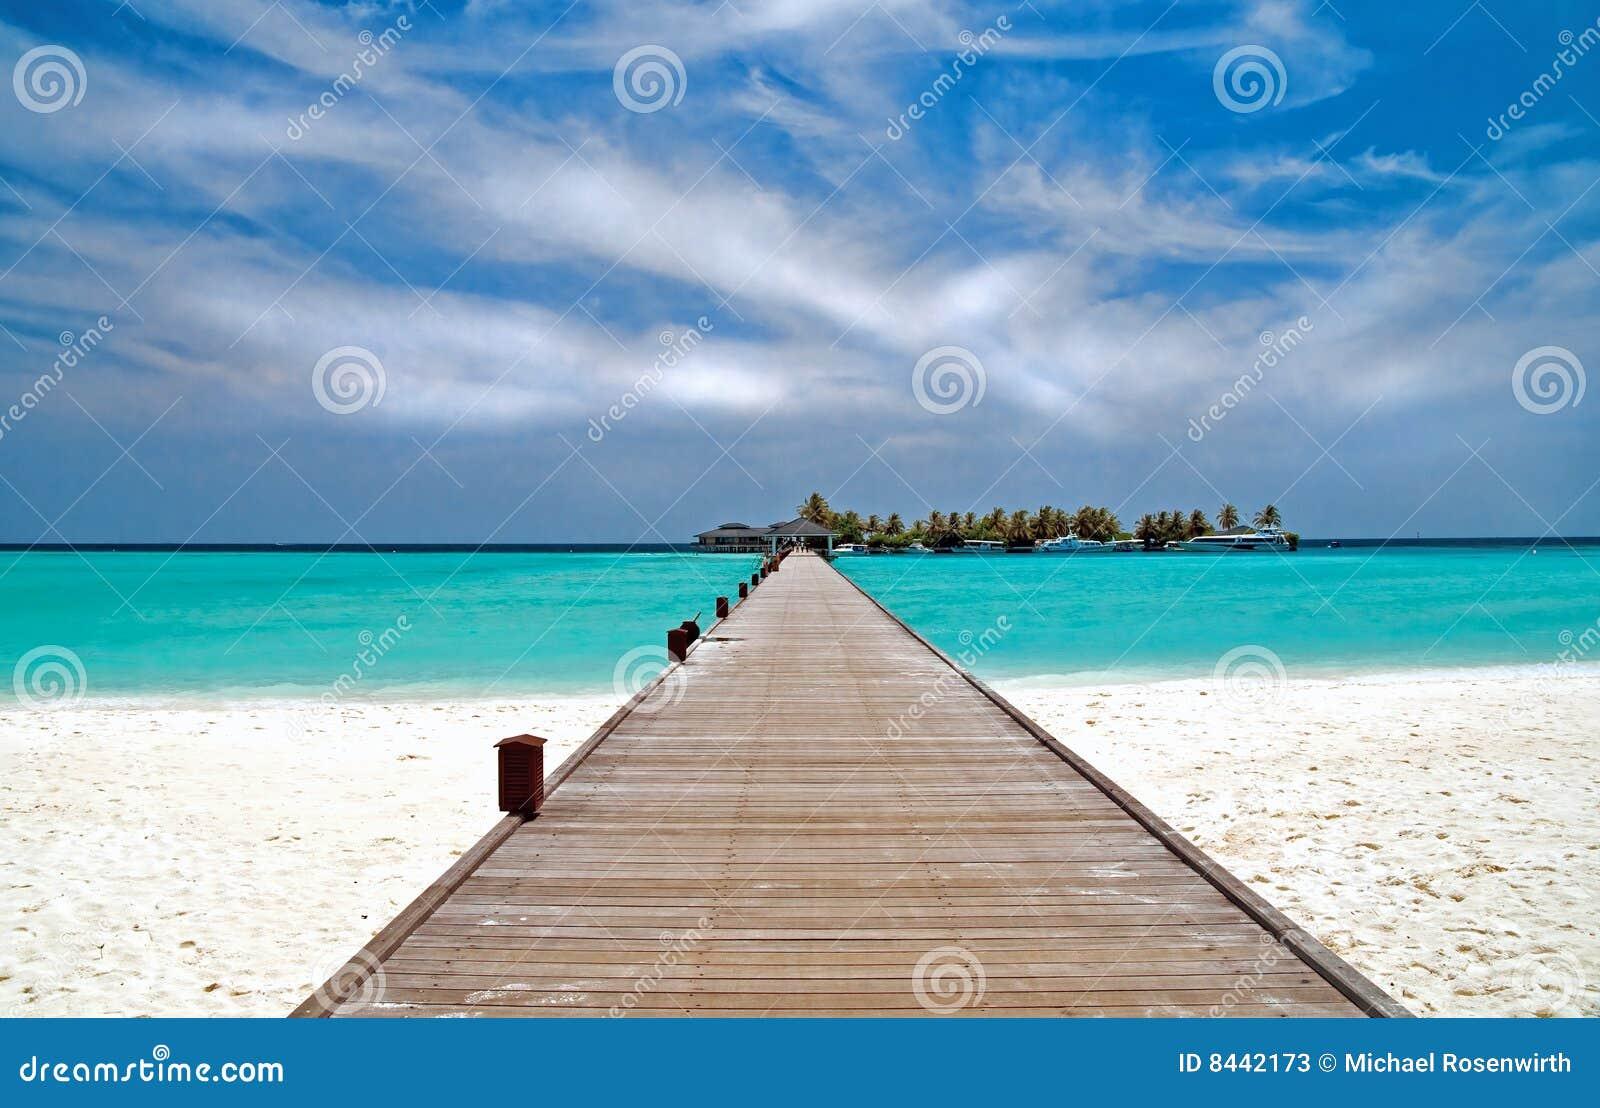 Jetty on a tropical beach